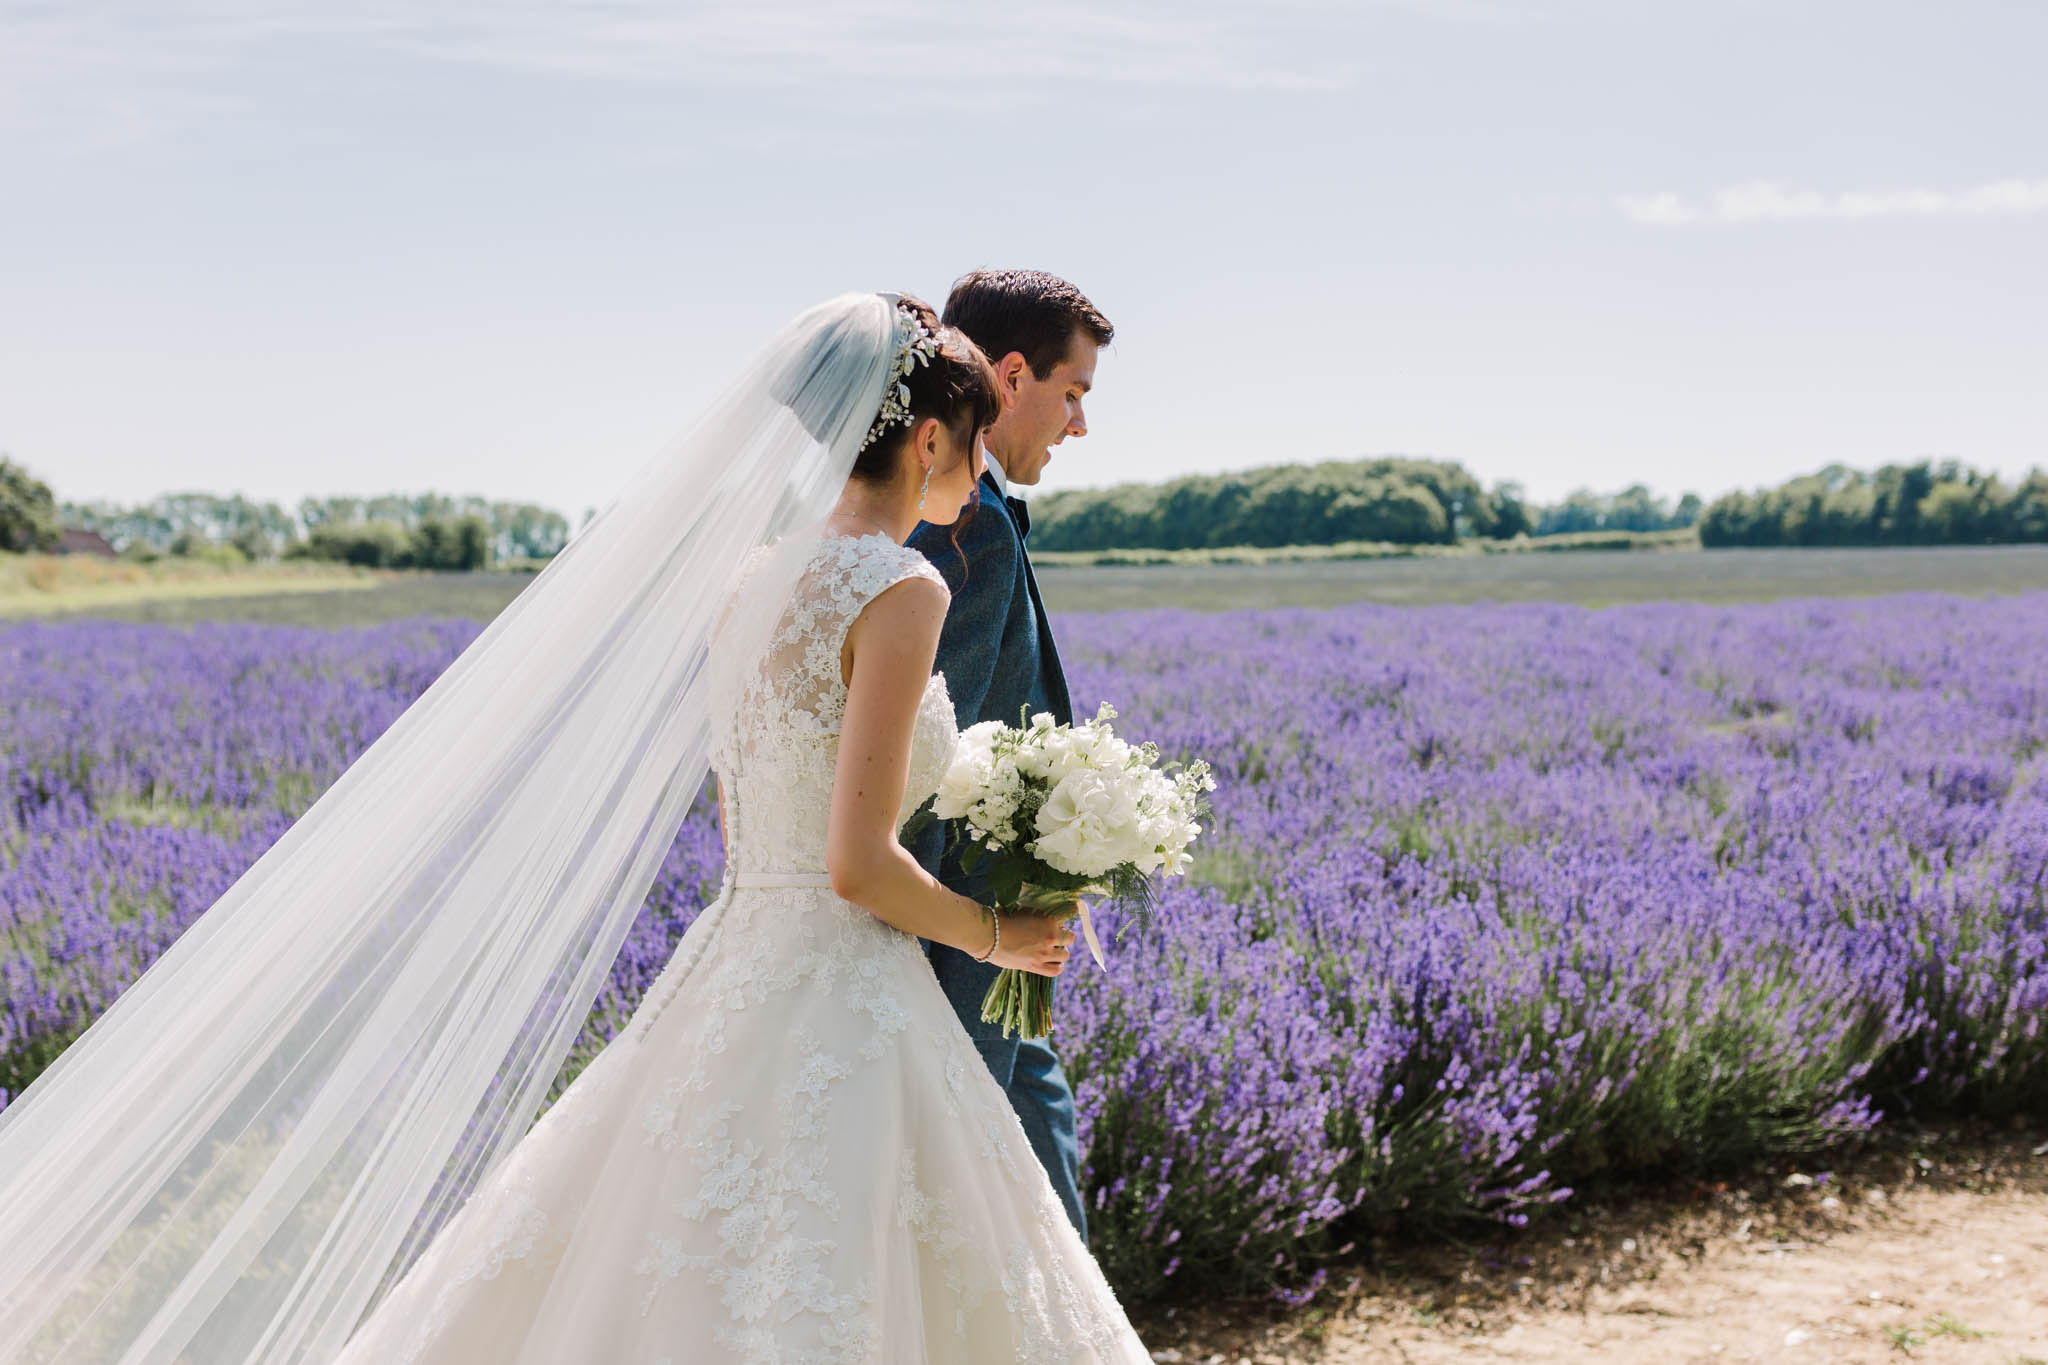 bride and groom walking through lavender field